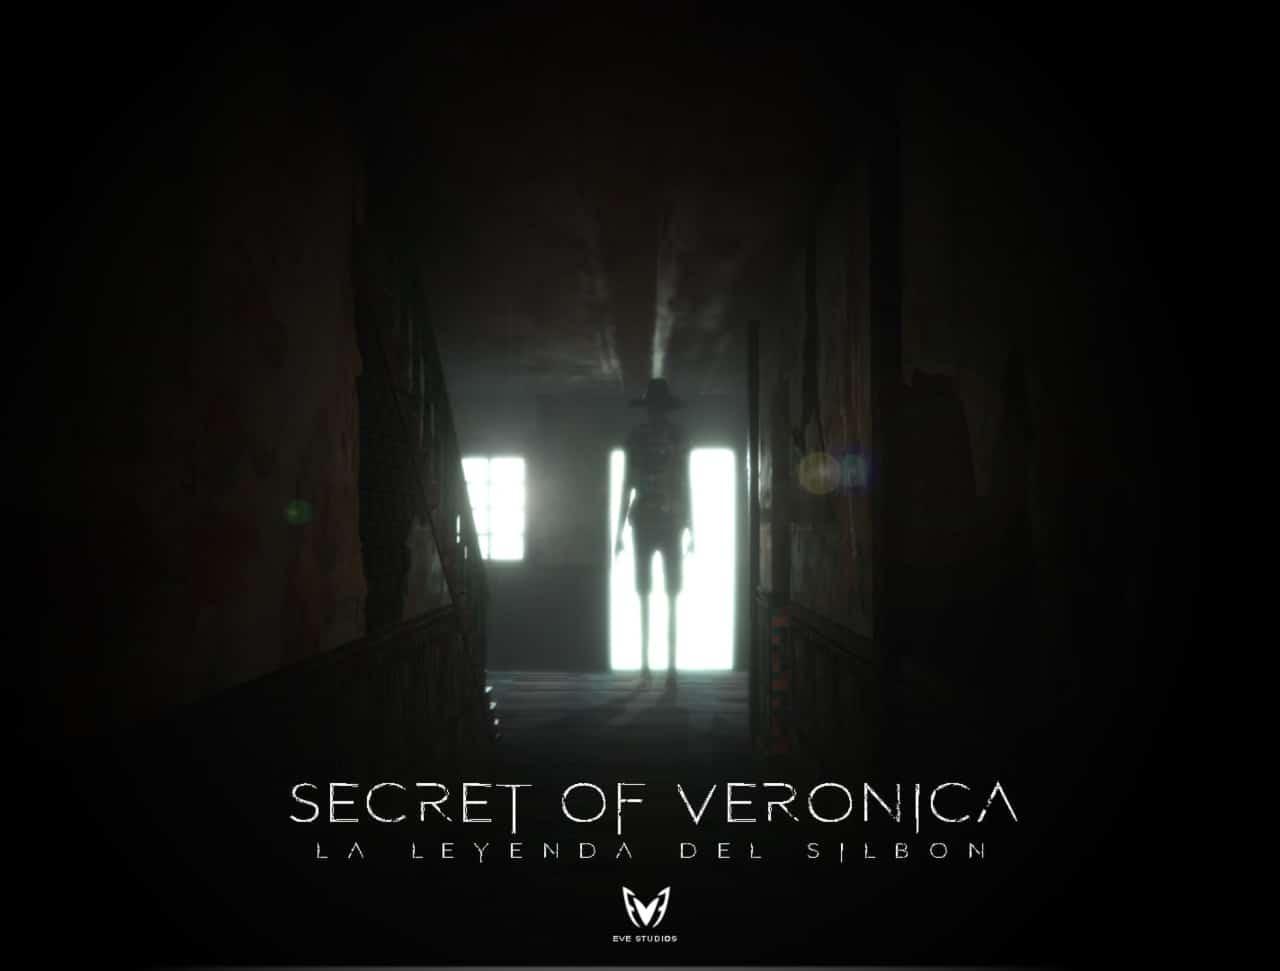 Secret-of-Veronica-La-Leyenda-del-Silbon-GamersRD (1)